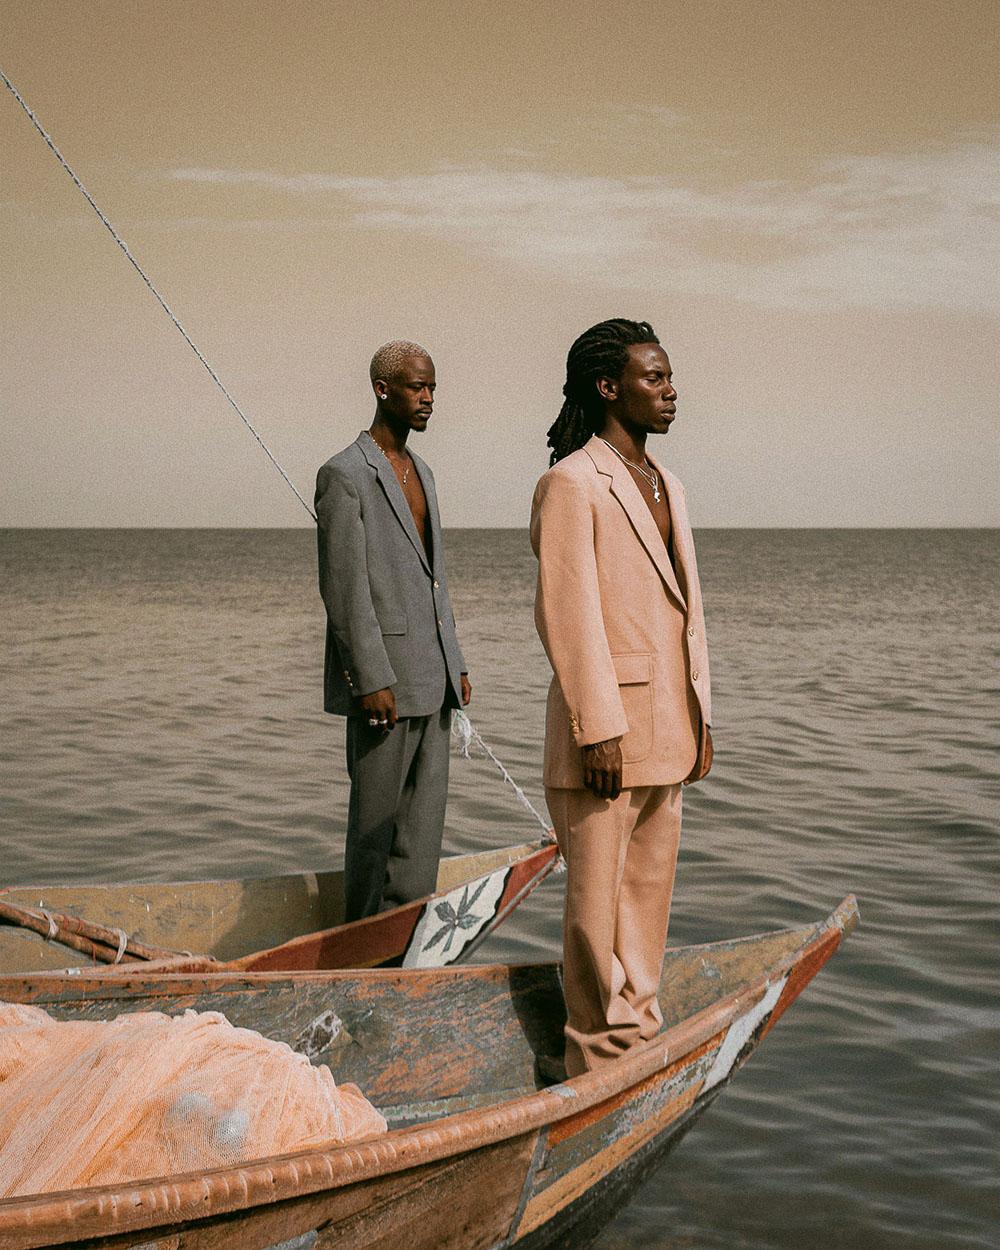 The Rusinga Drip | A fashion story by Kenyan collective Urbanpitchaz